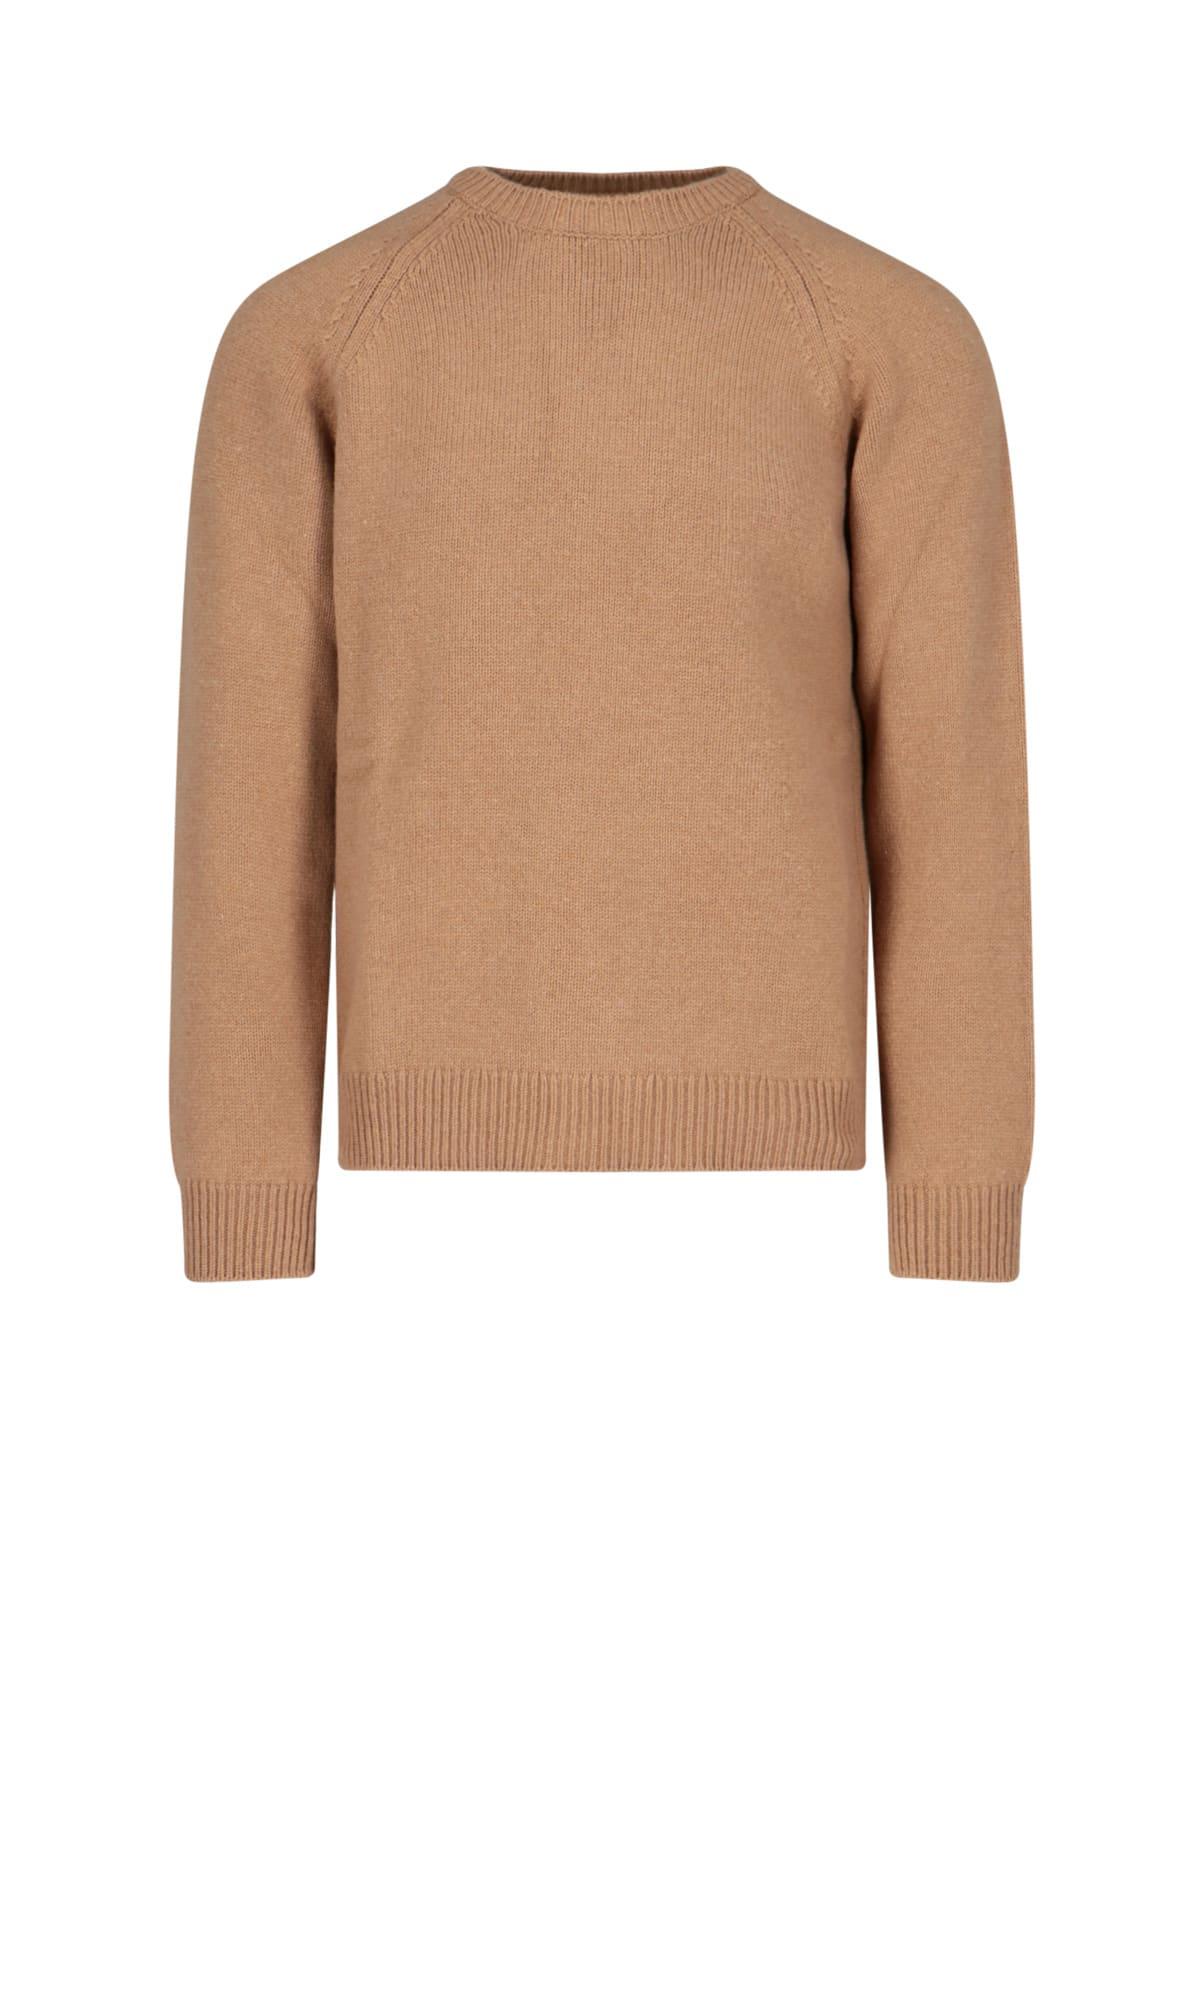 A.p.c. Sweaters PABLO CLASSIC SWEATER